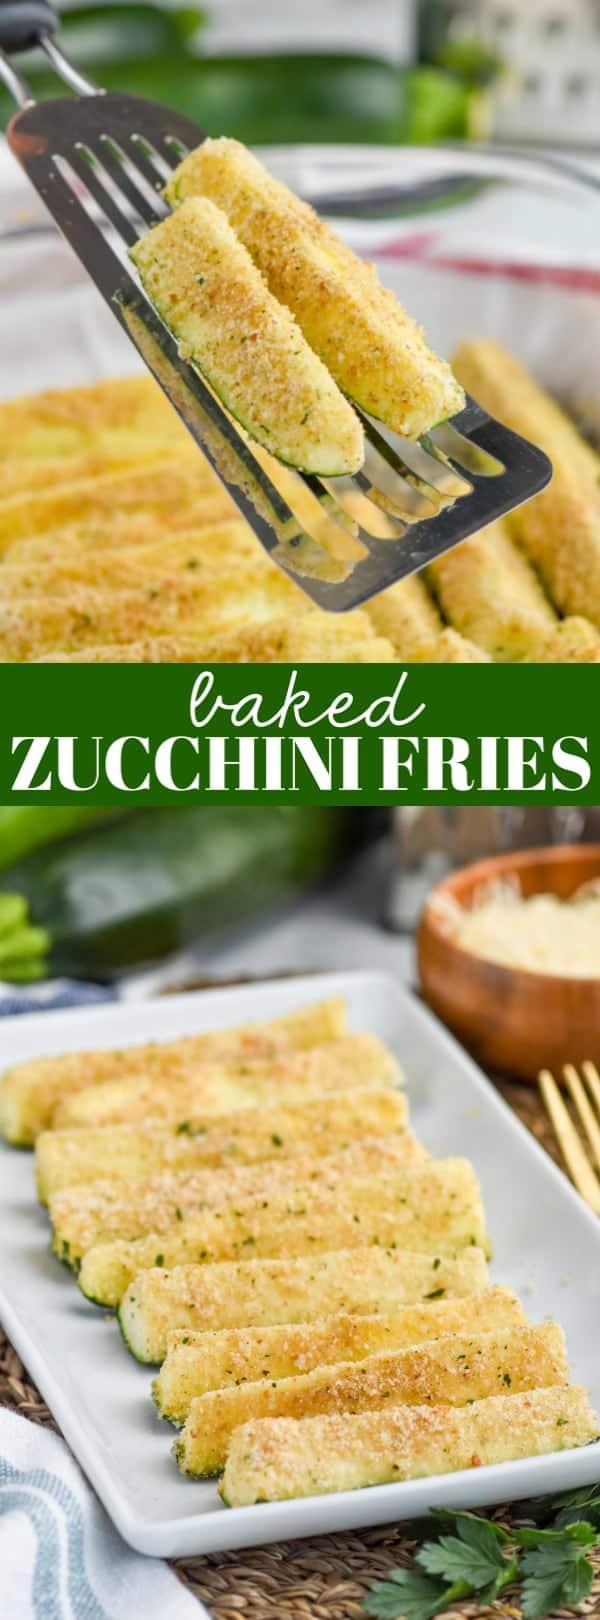 spatula holding zucchini fries recipe